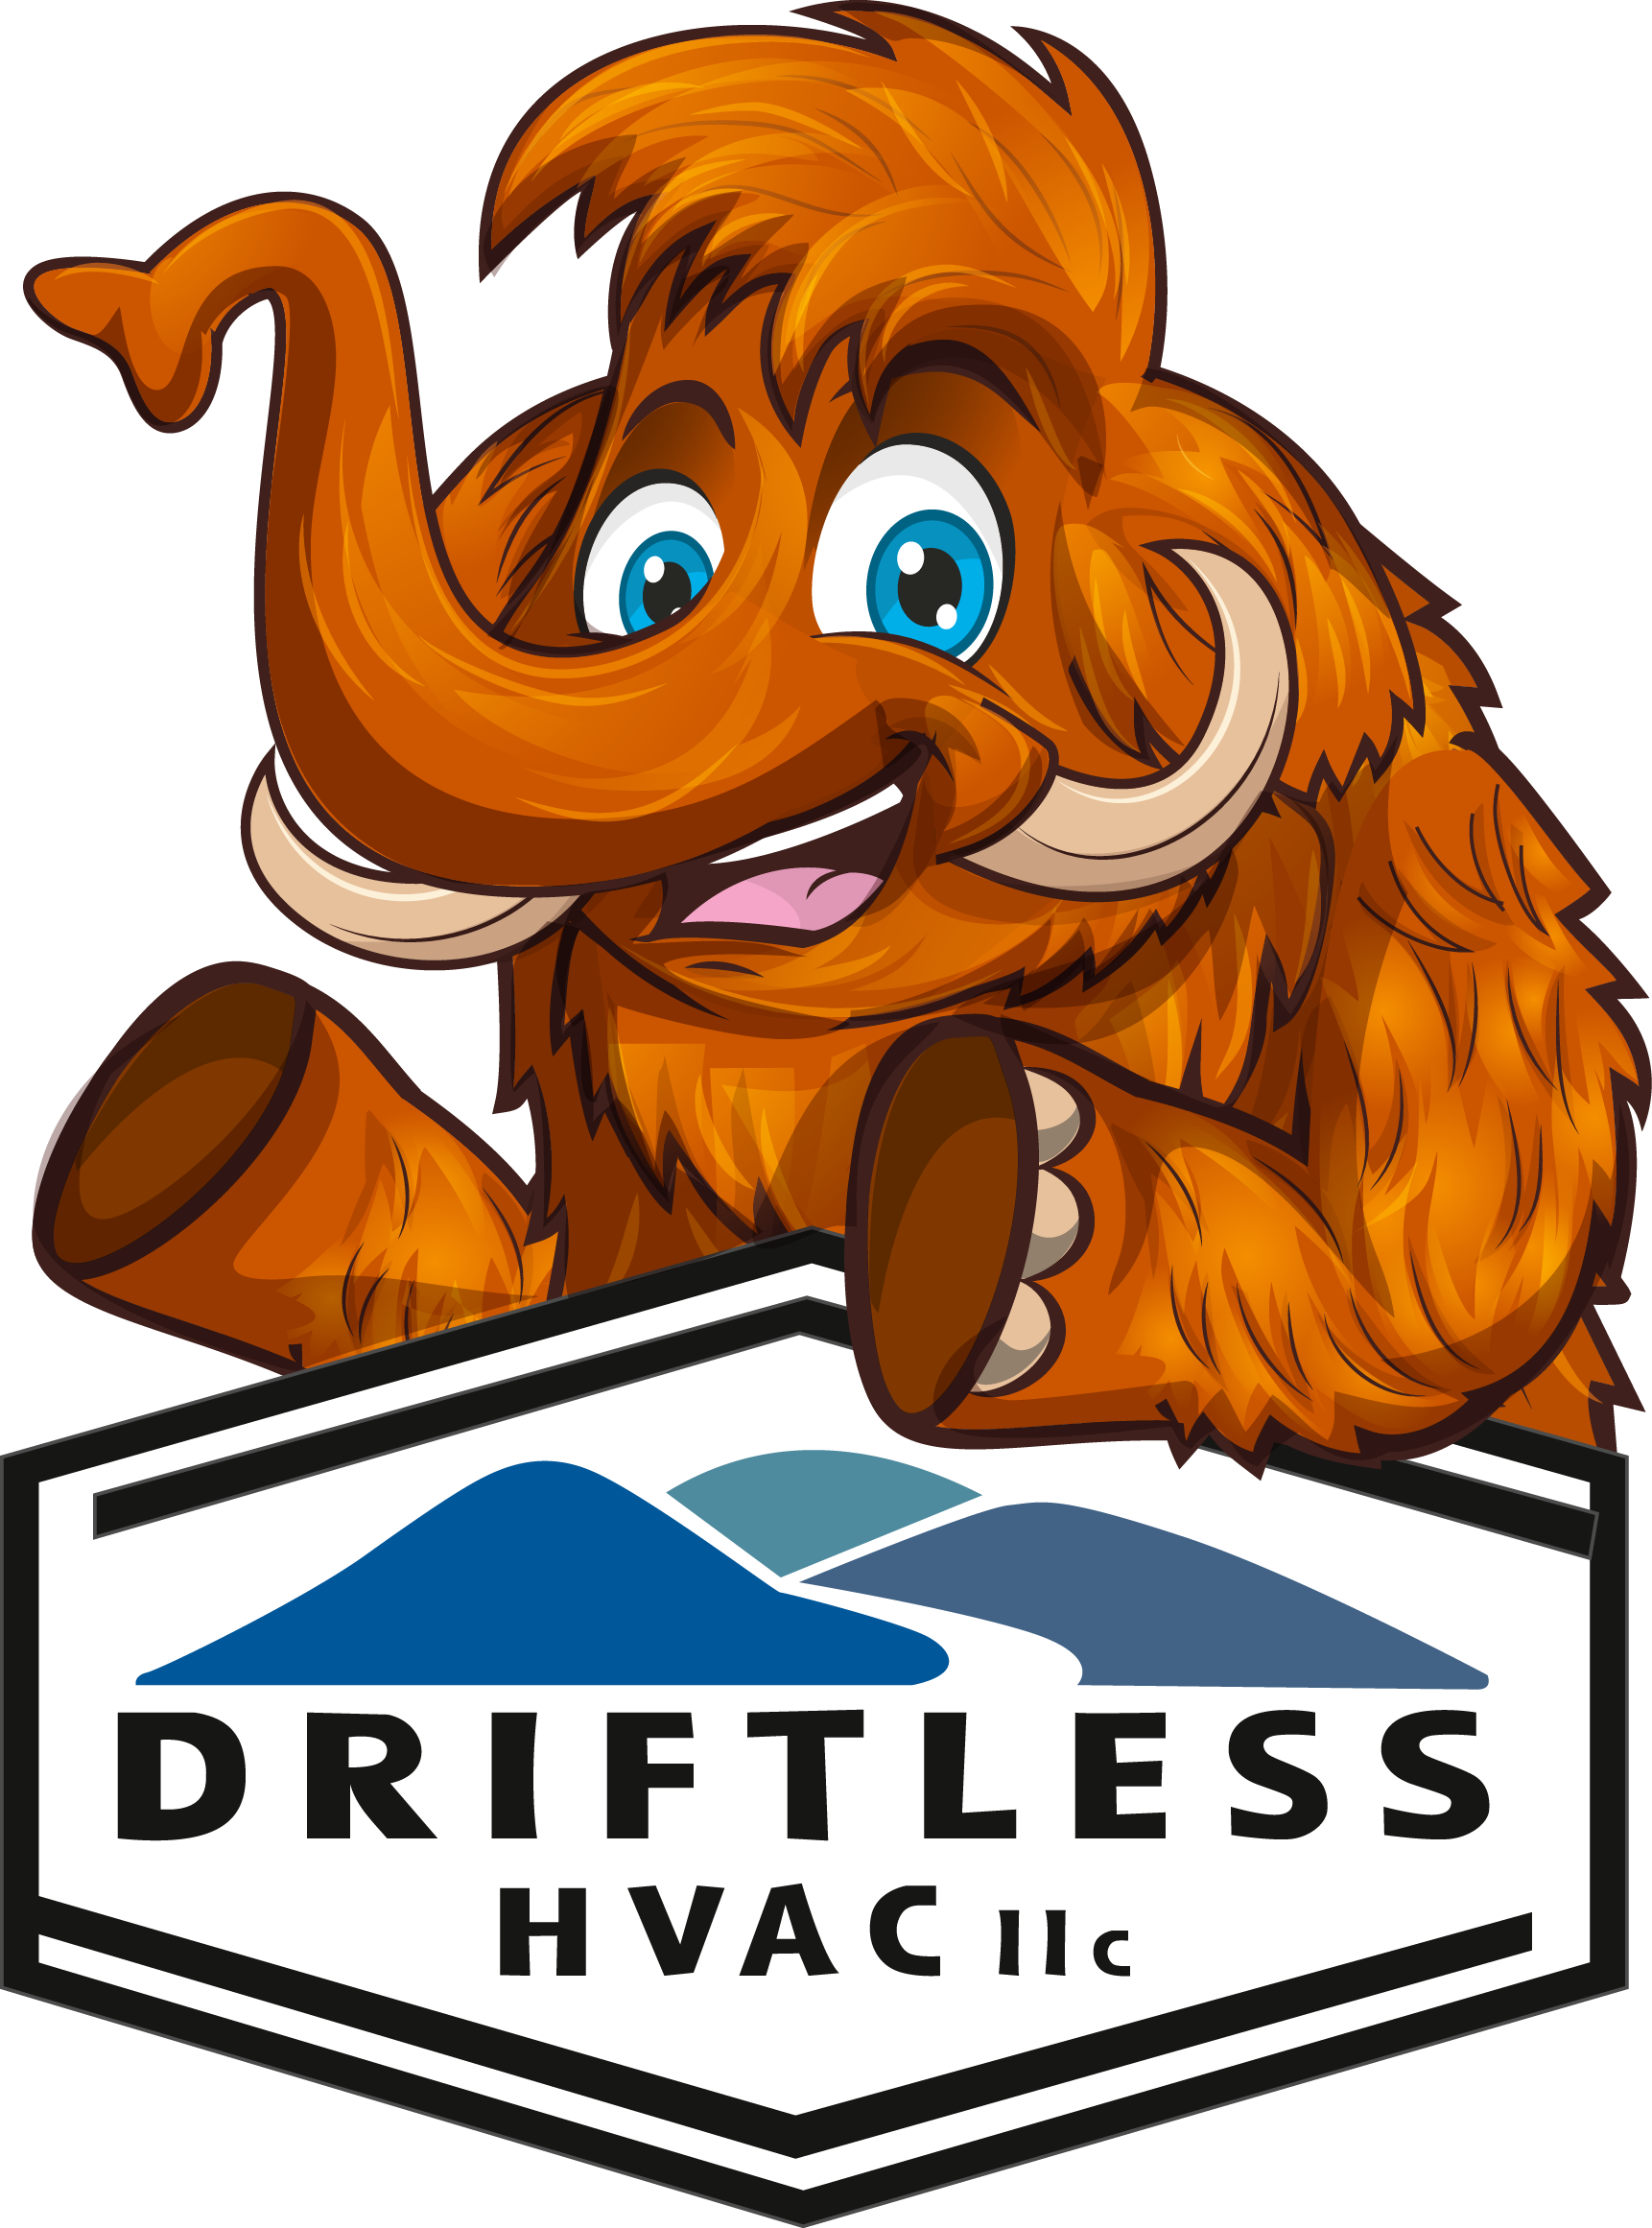 Driftless Hvac Llc.